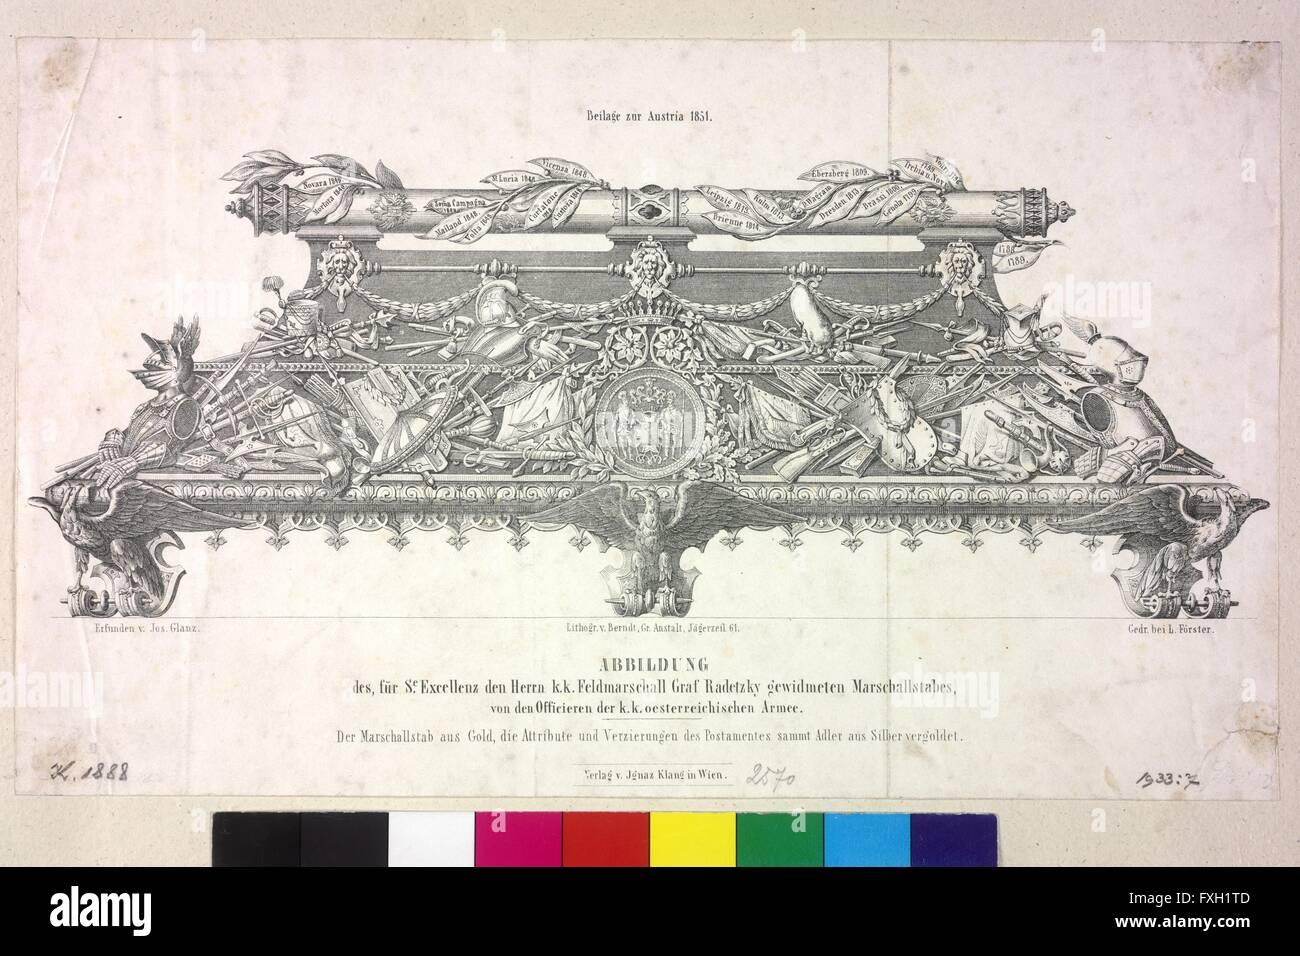 Marschallstab für Feldmarschall Graf Radetzky - Stock Image